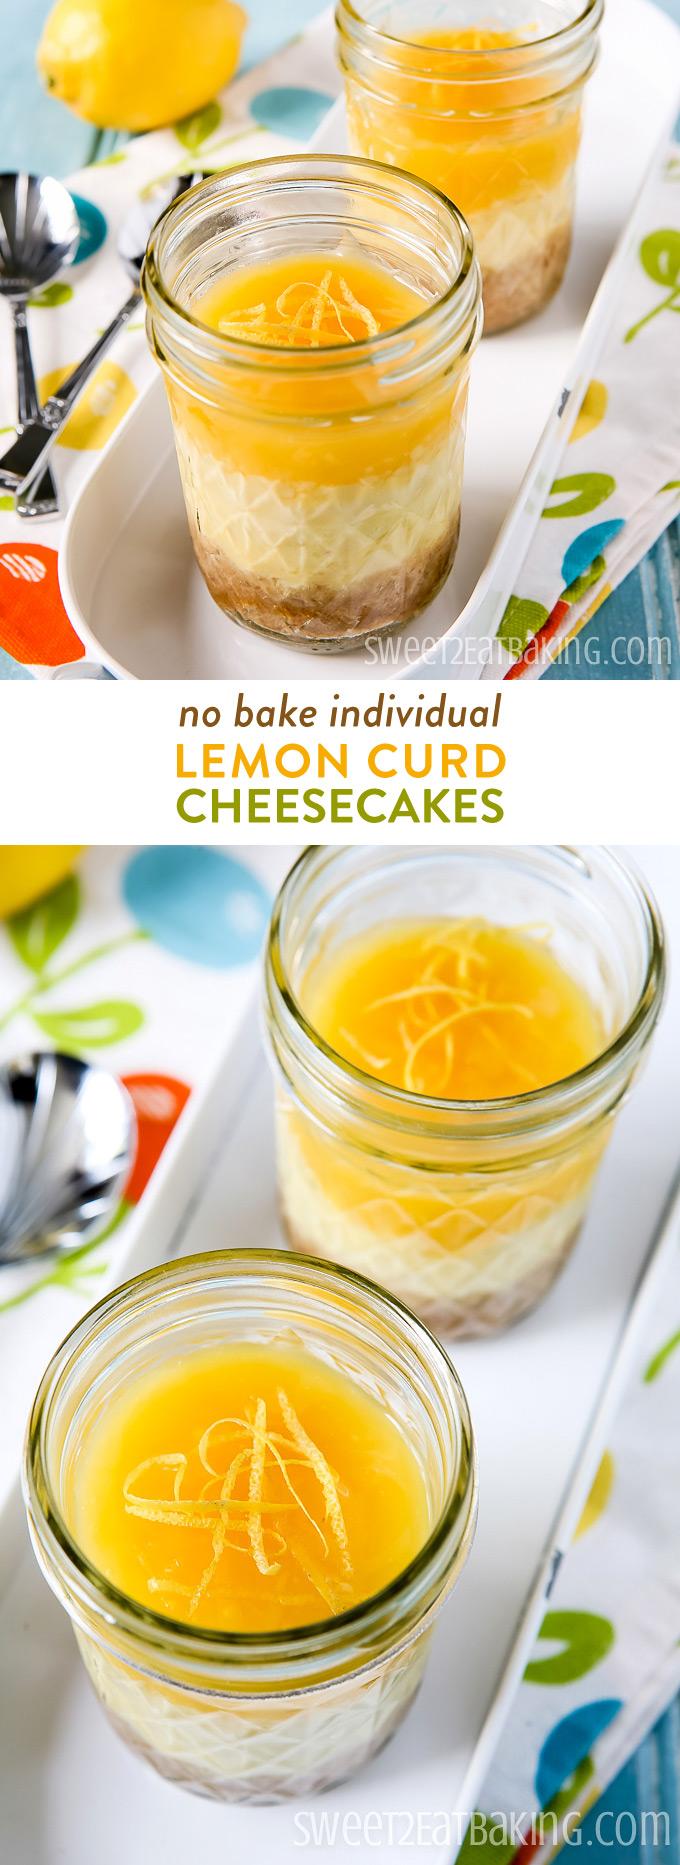 No Bake Individual Lemon Curd Cheesecakes Recipe by Sweet2EatBaking.com